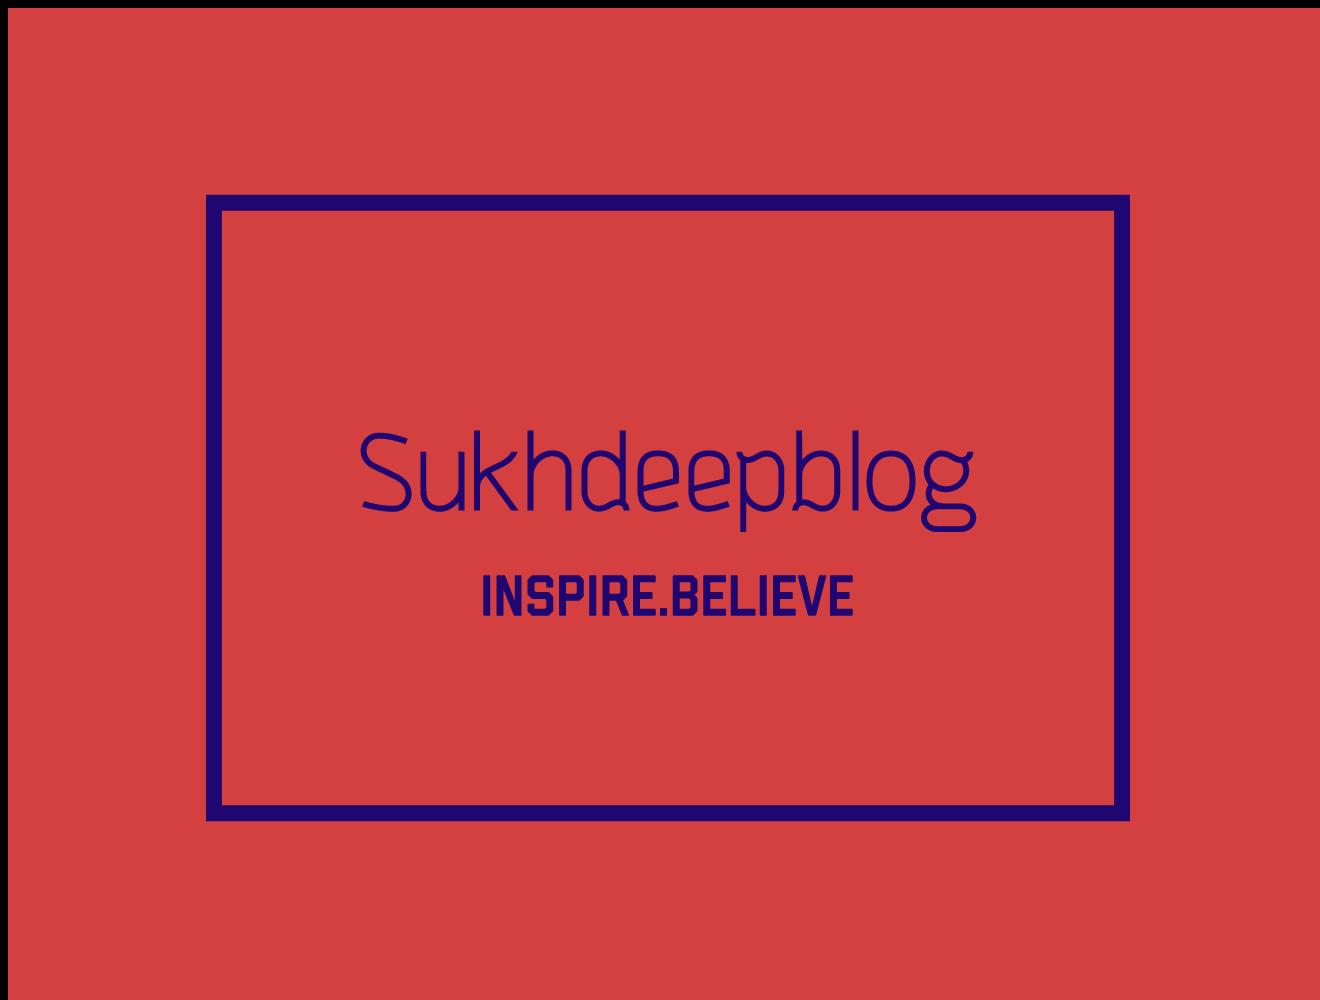 Windows 10 Auto Pilot simplified – sukhdeepblogs